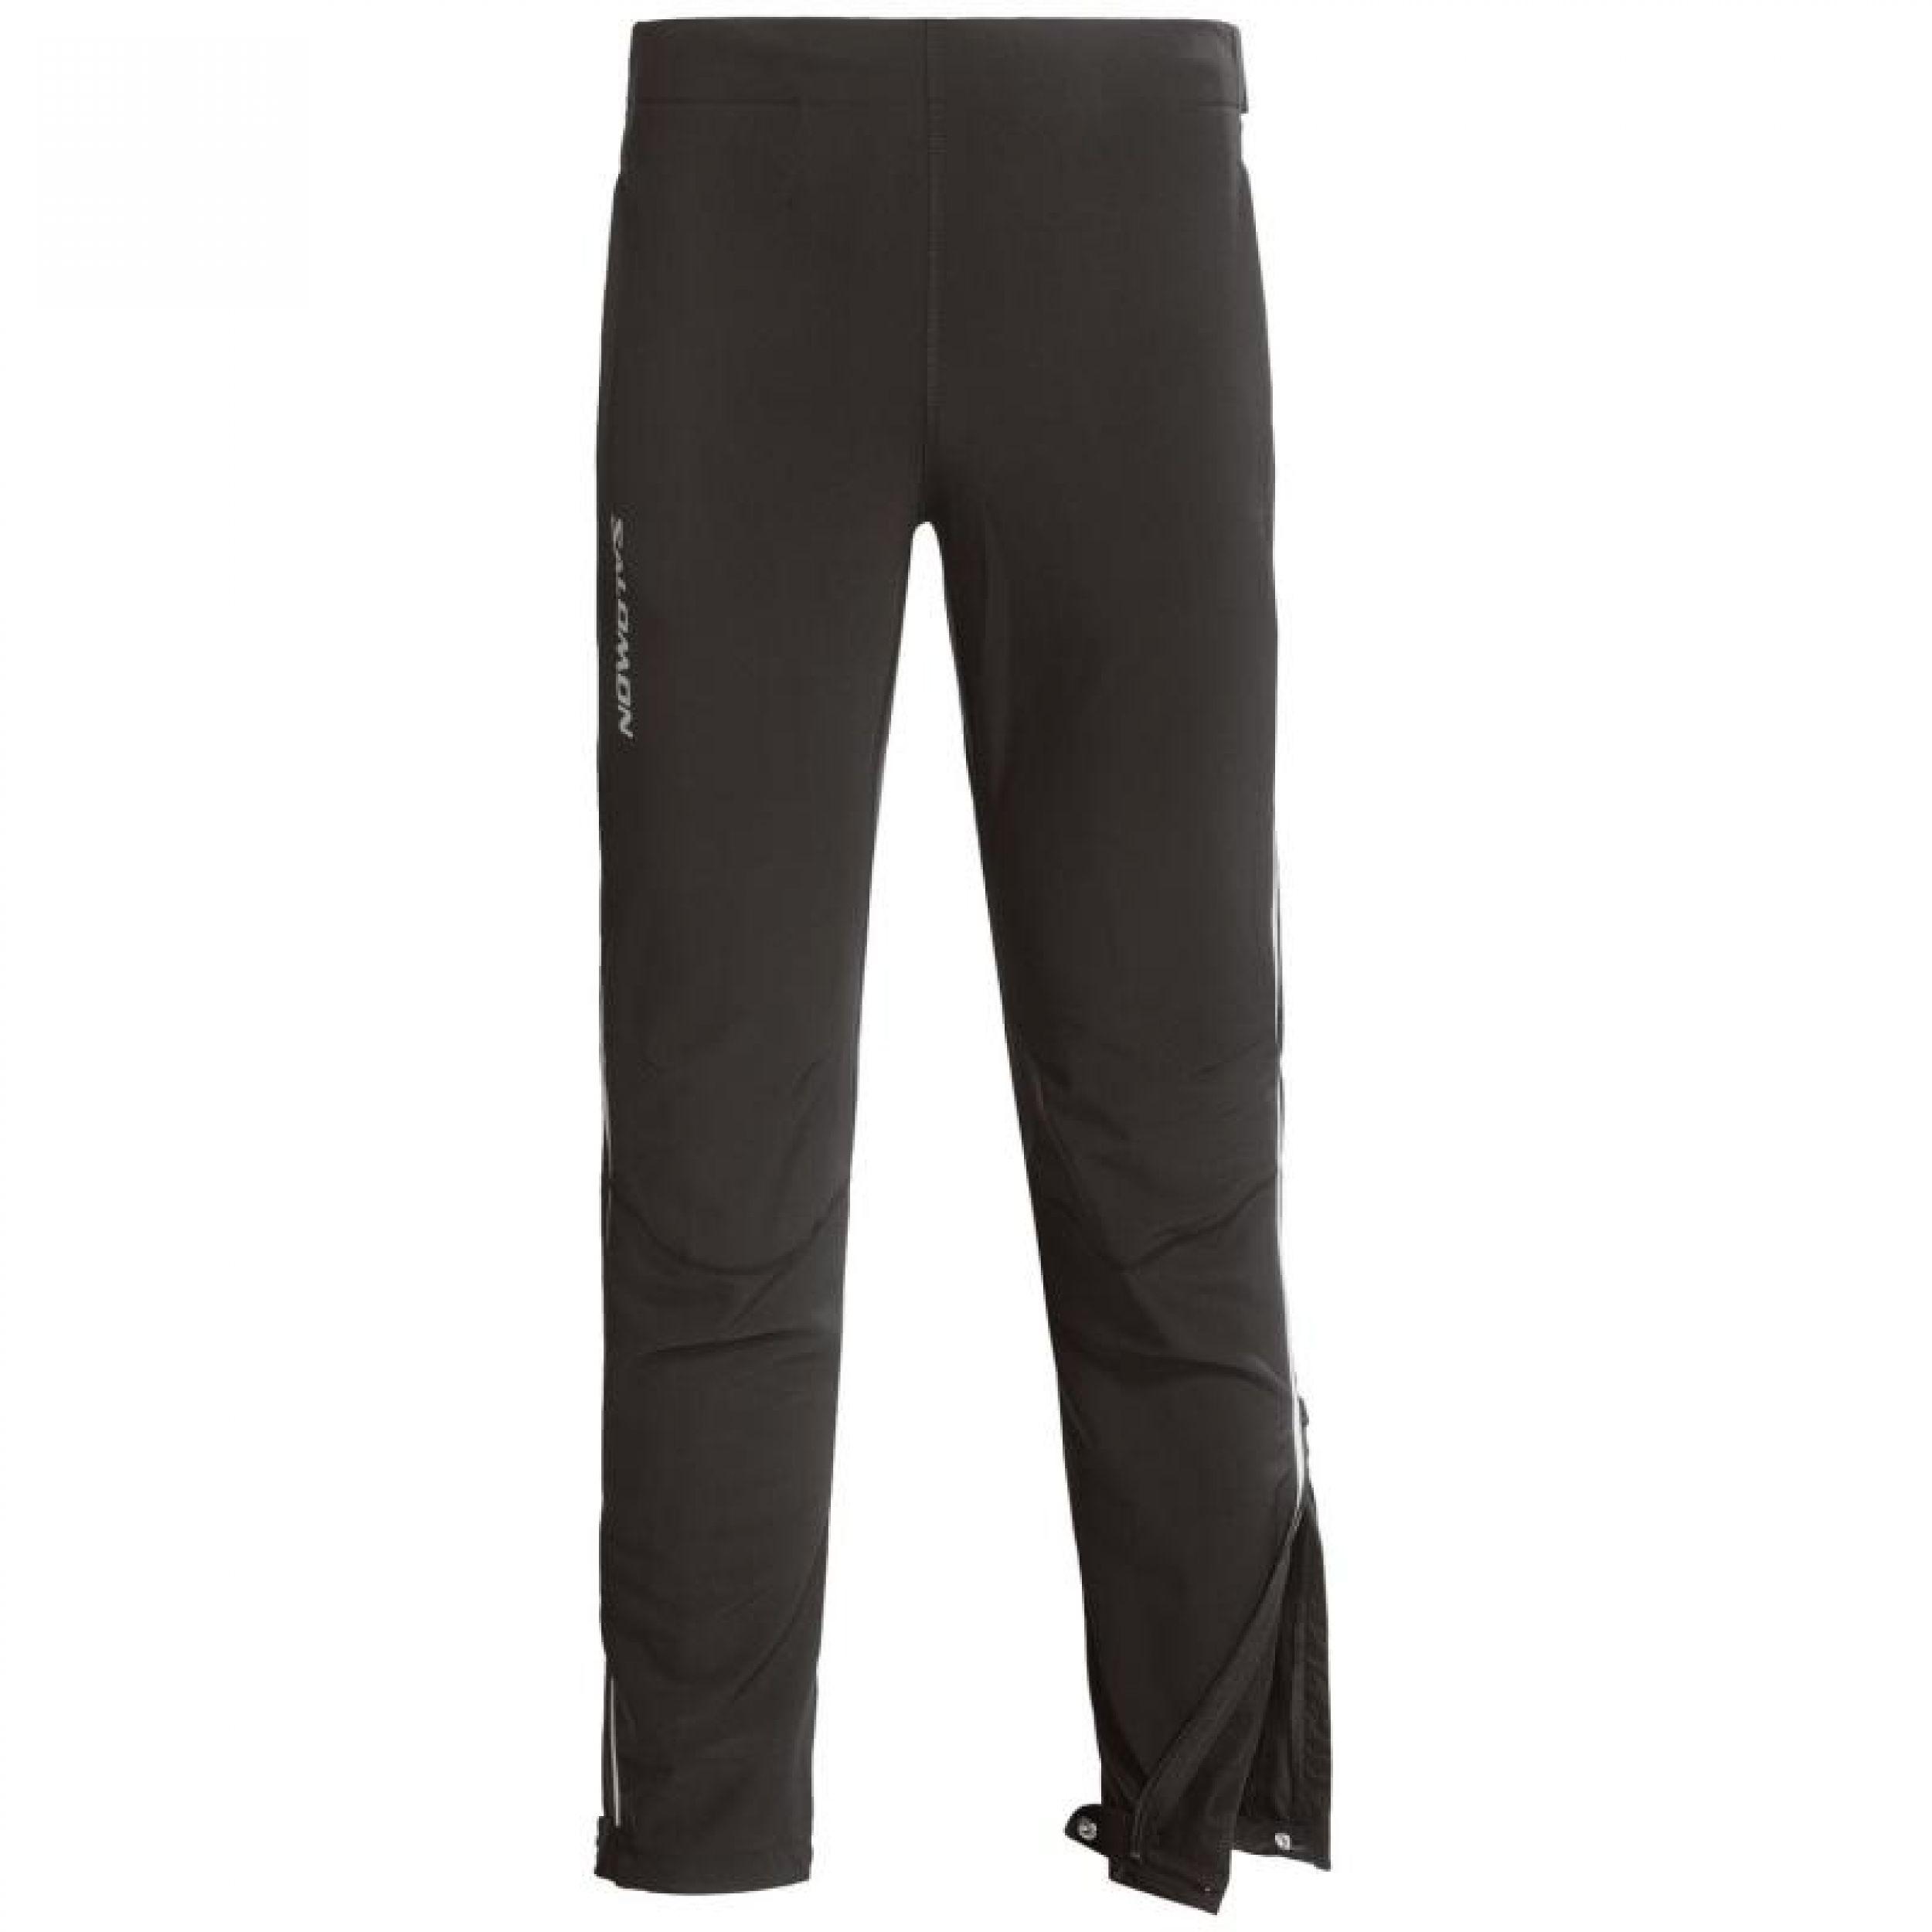 salomon-momentum-ii-full-zip-pants-windproof-soft-shell-for-men-in-blackp6454y_011500.2.jpg